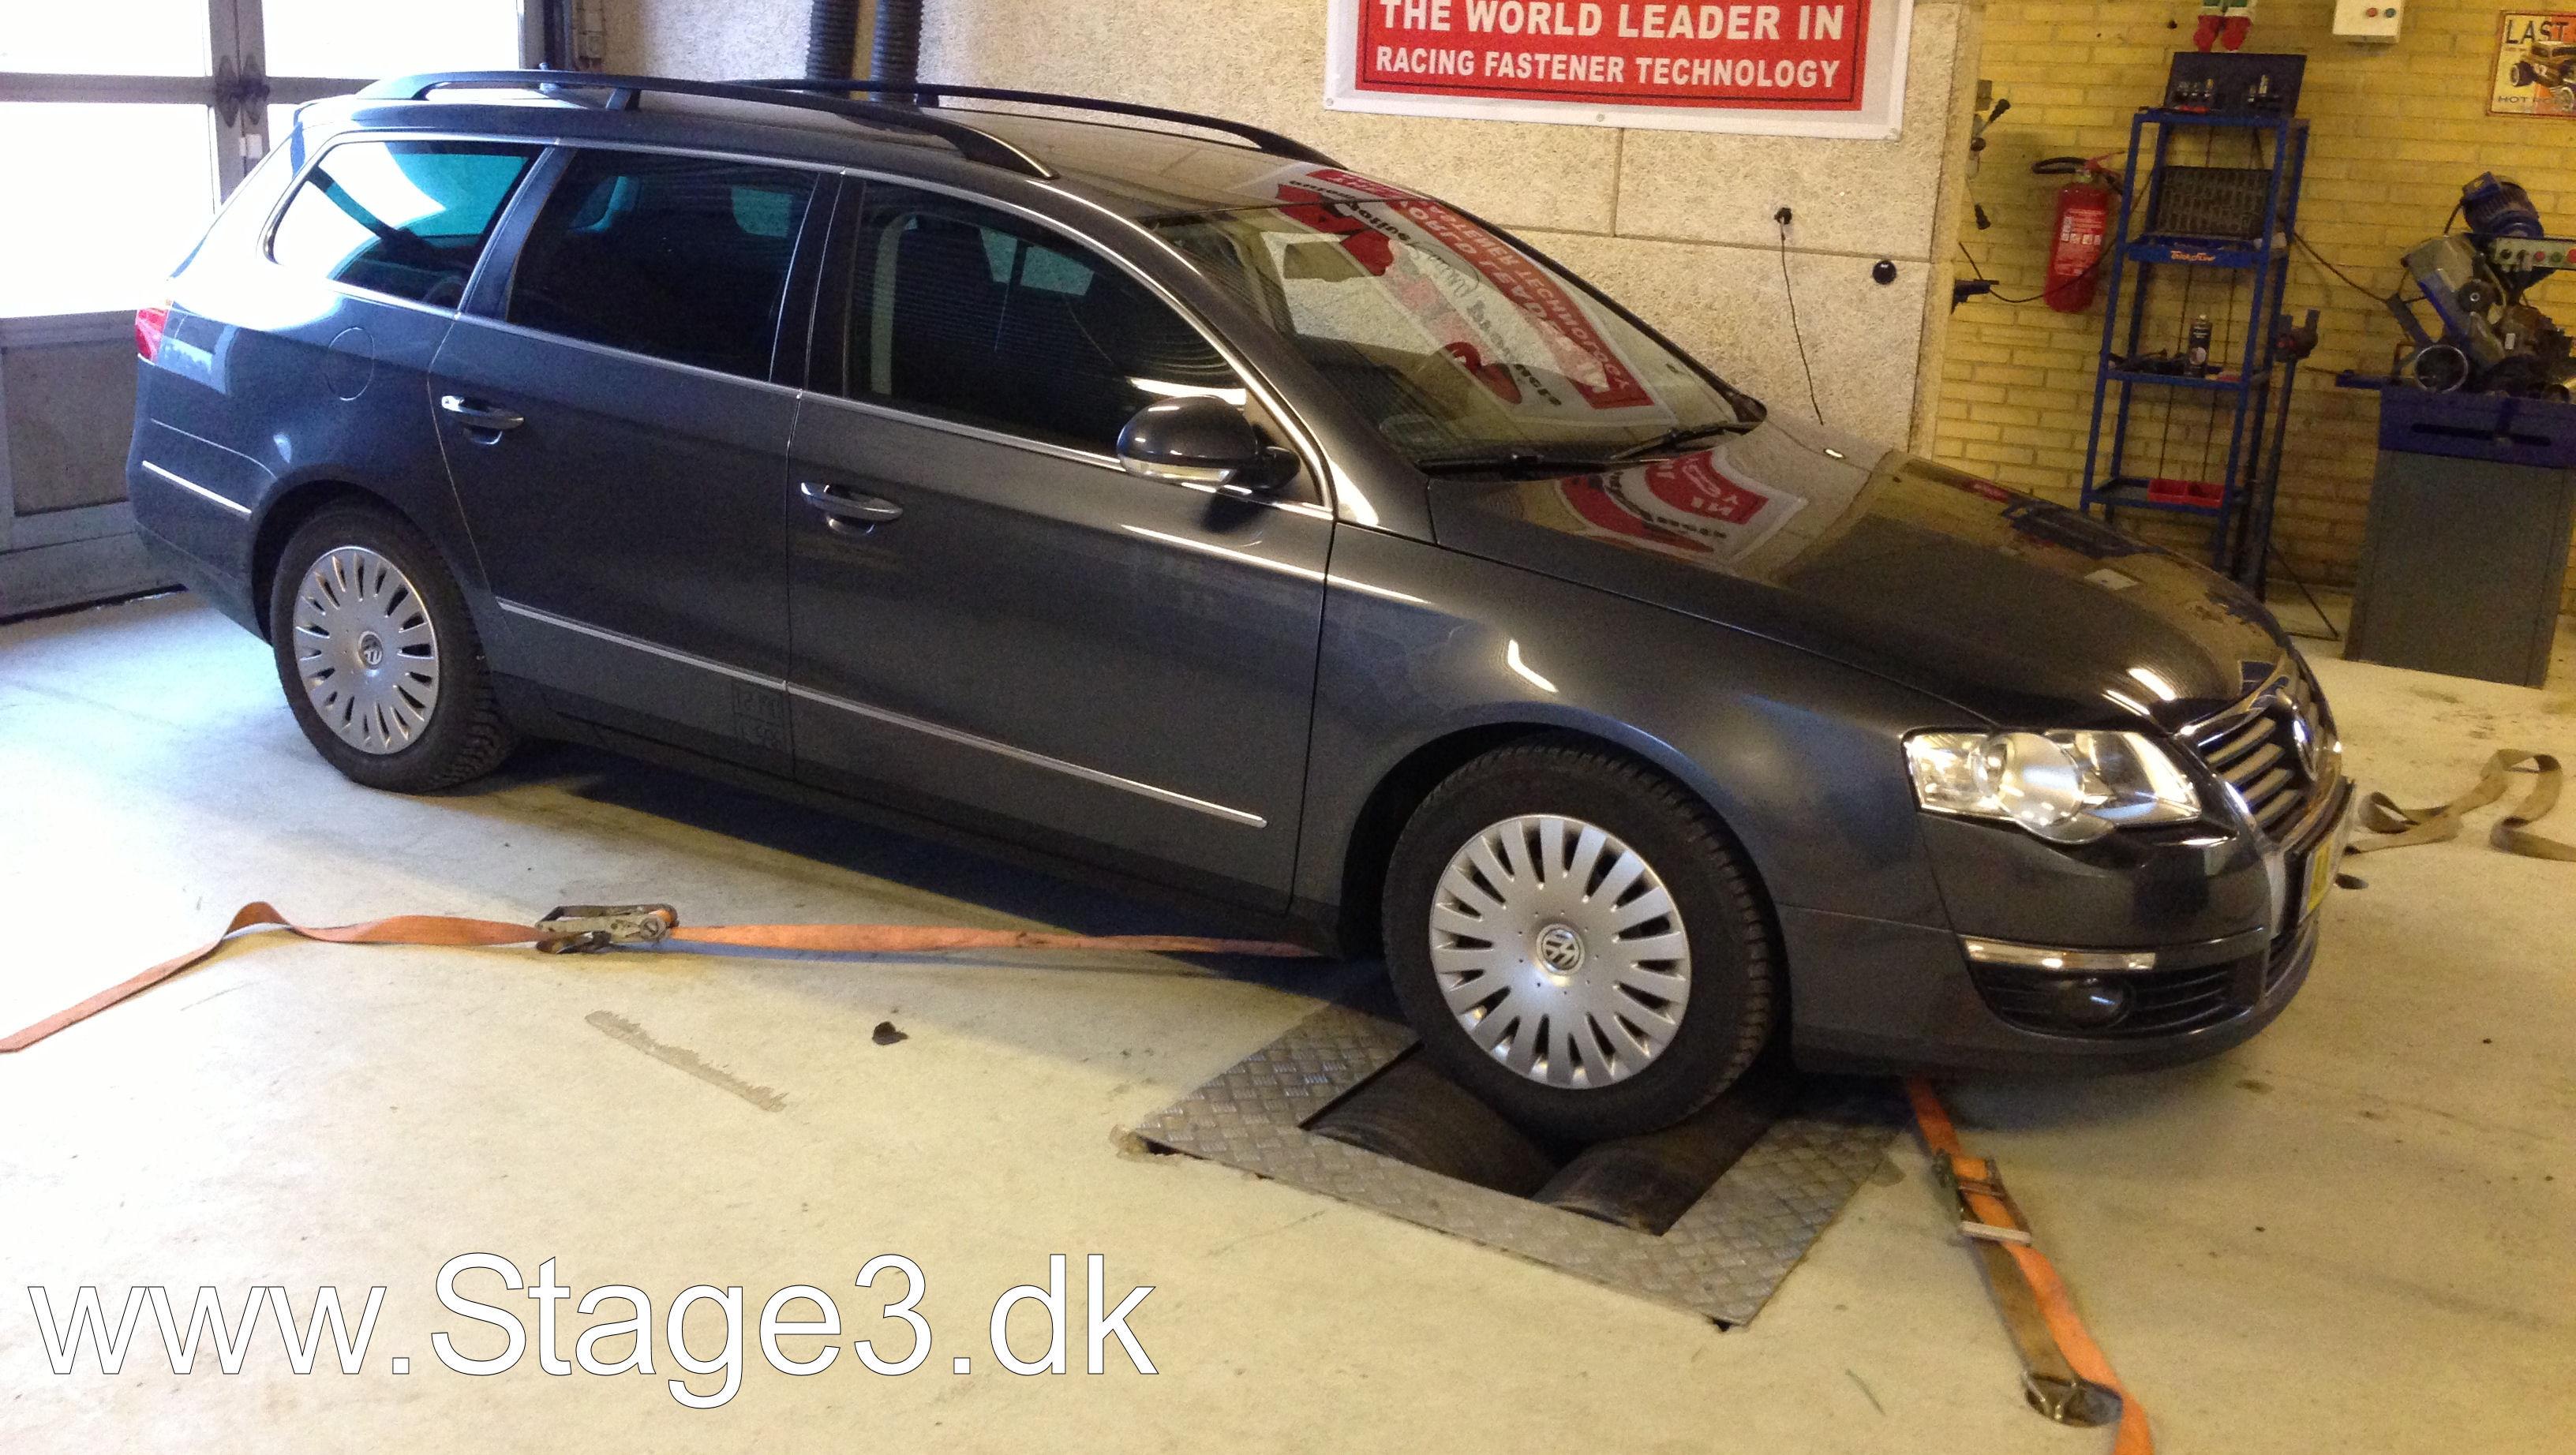 VW Passat 140 HK 2010 chiptuning (2)